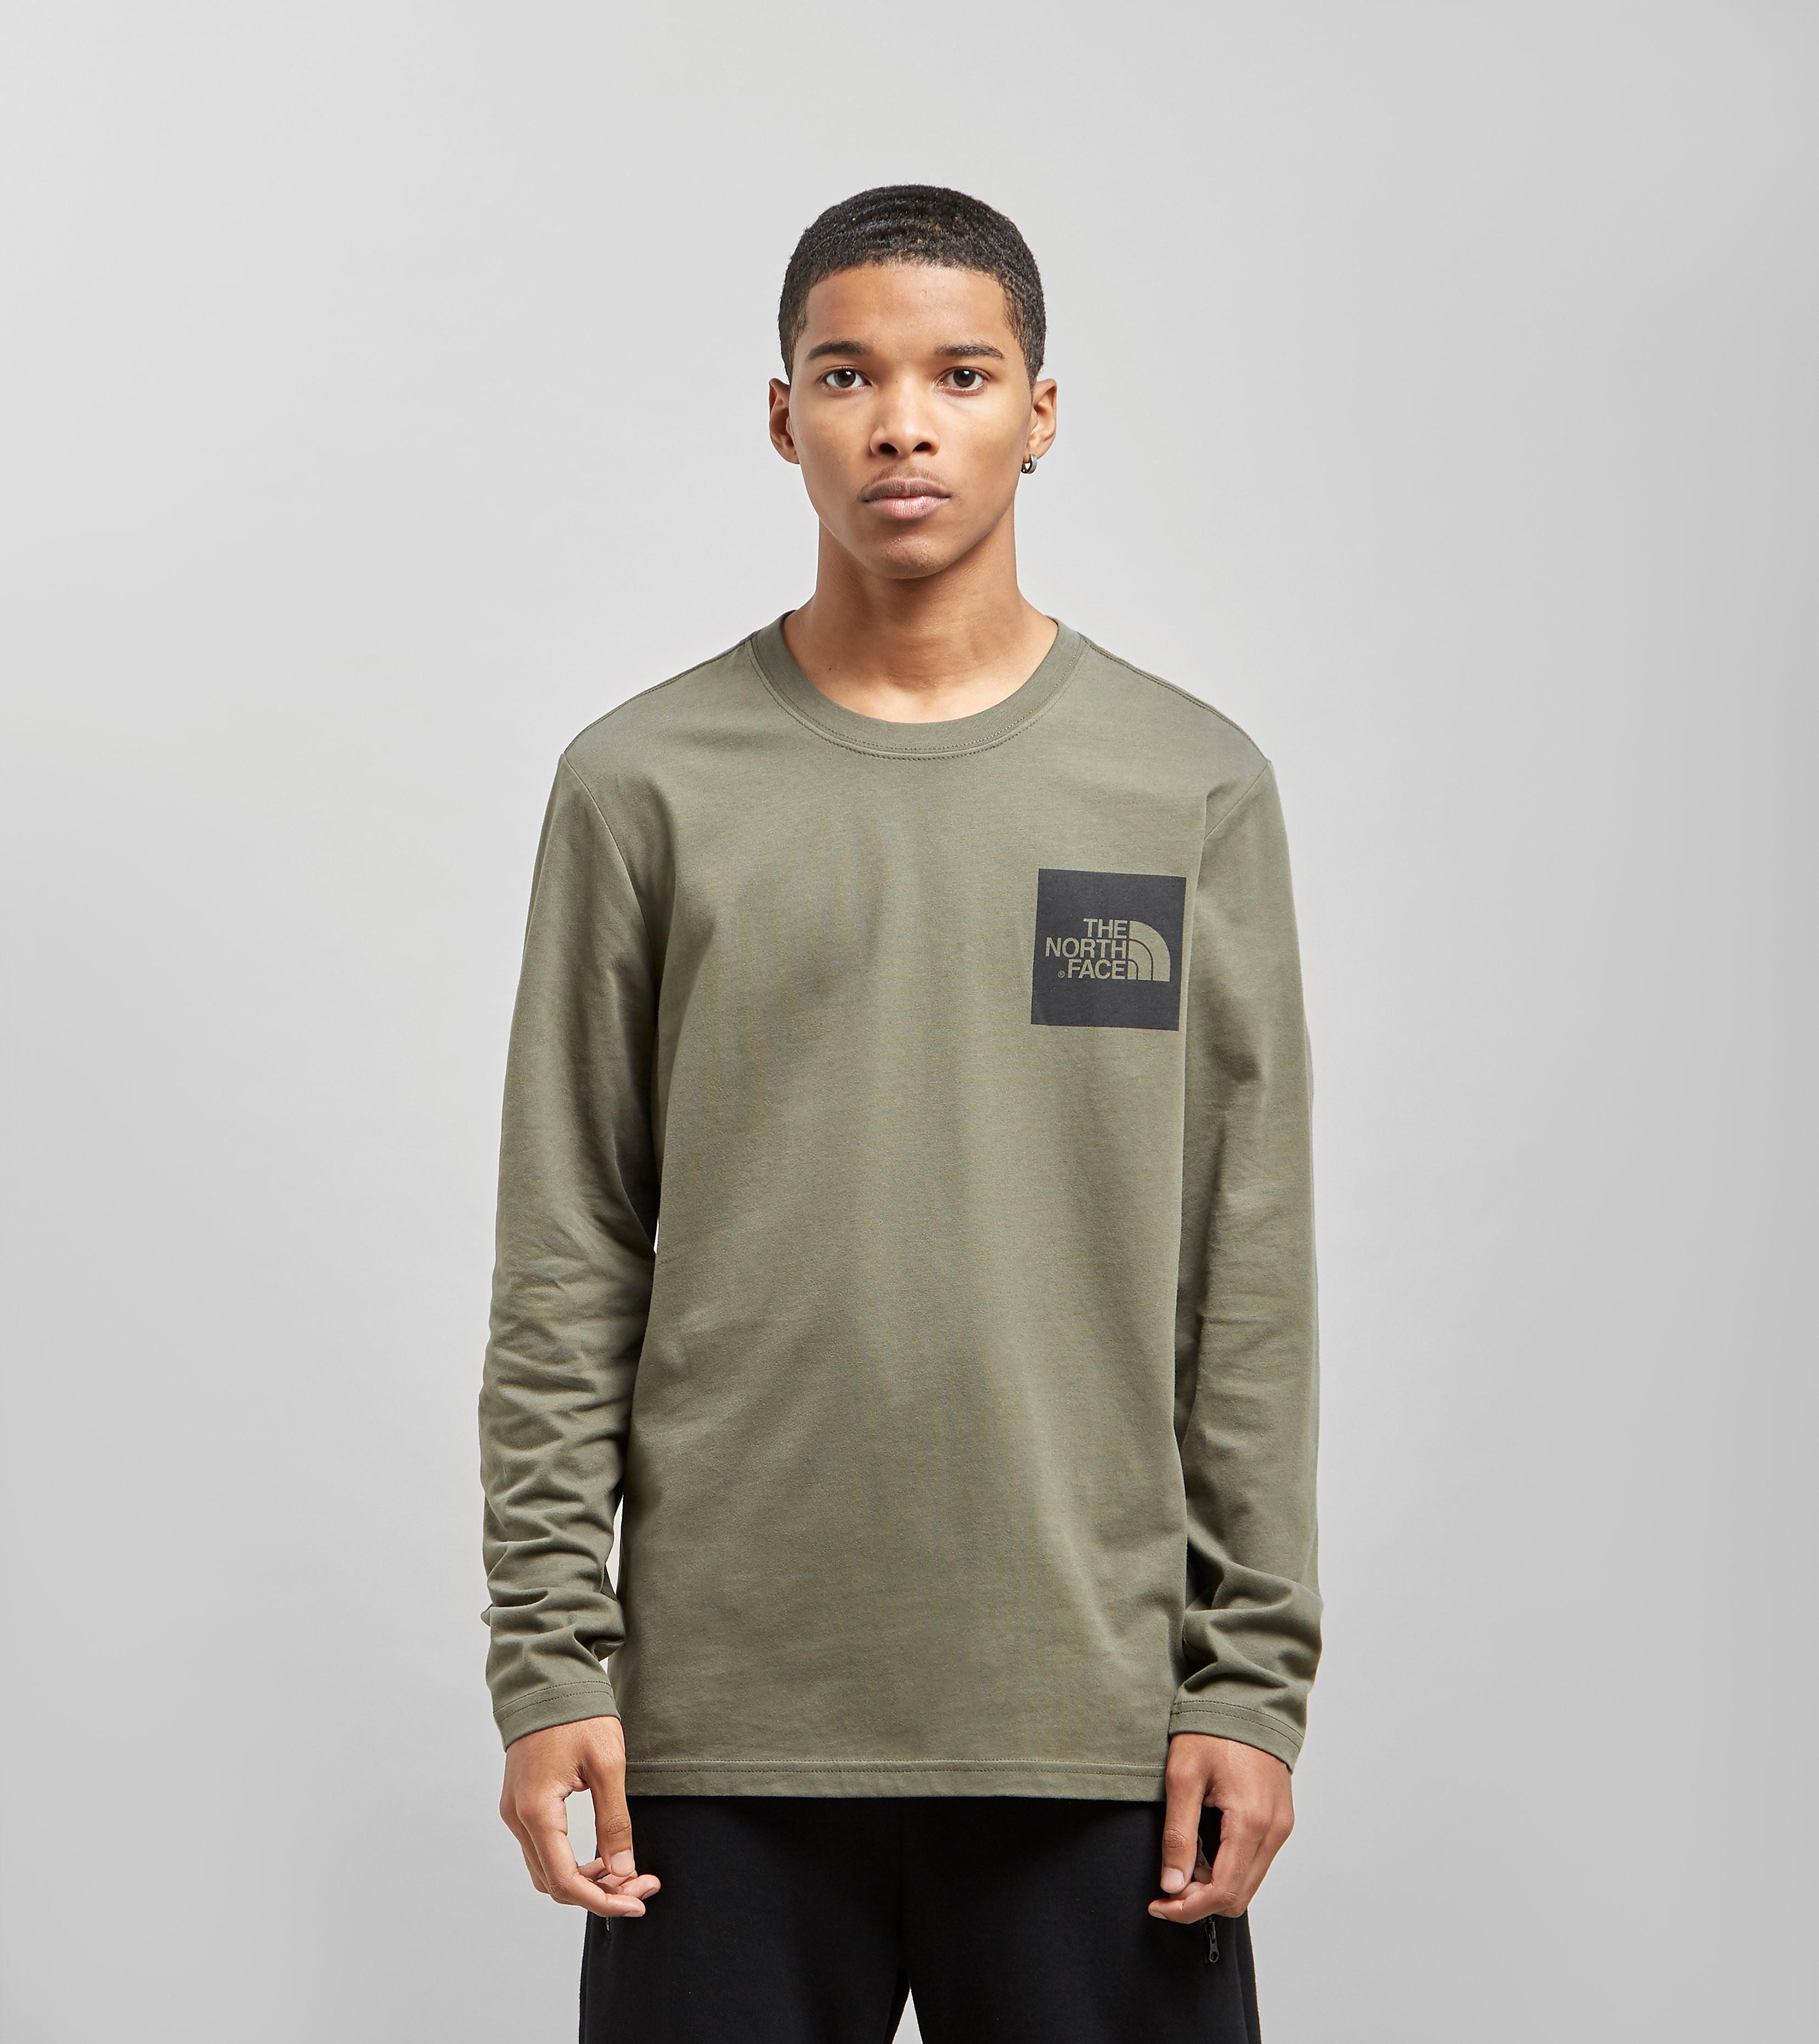 The North Face Long Sleeve Fine T-Shirt, Groen